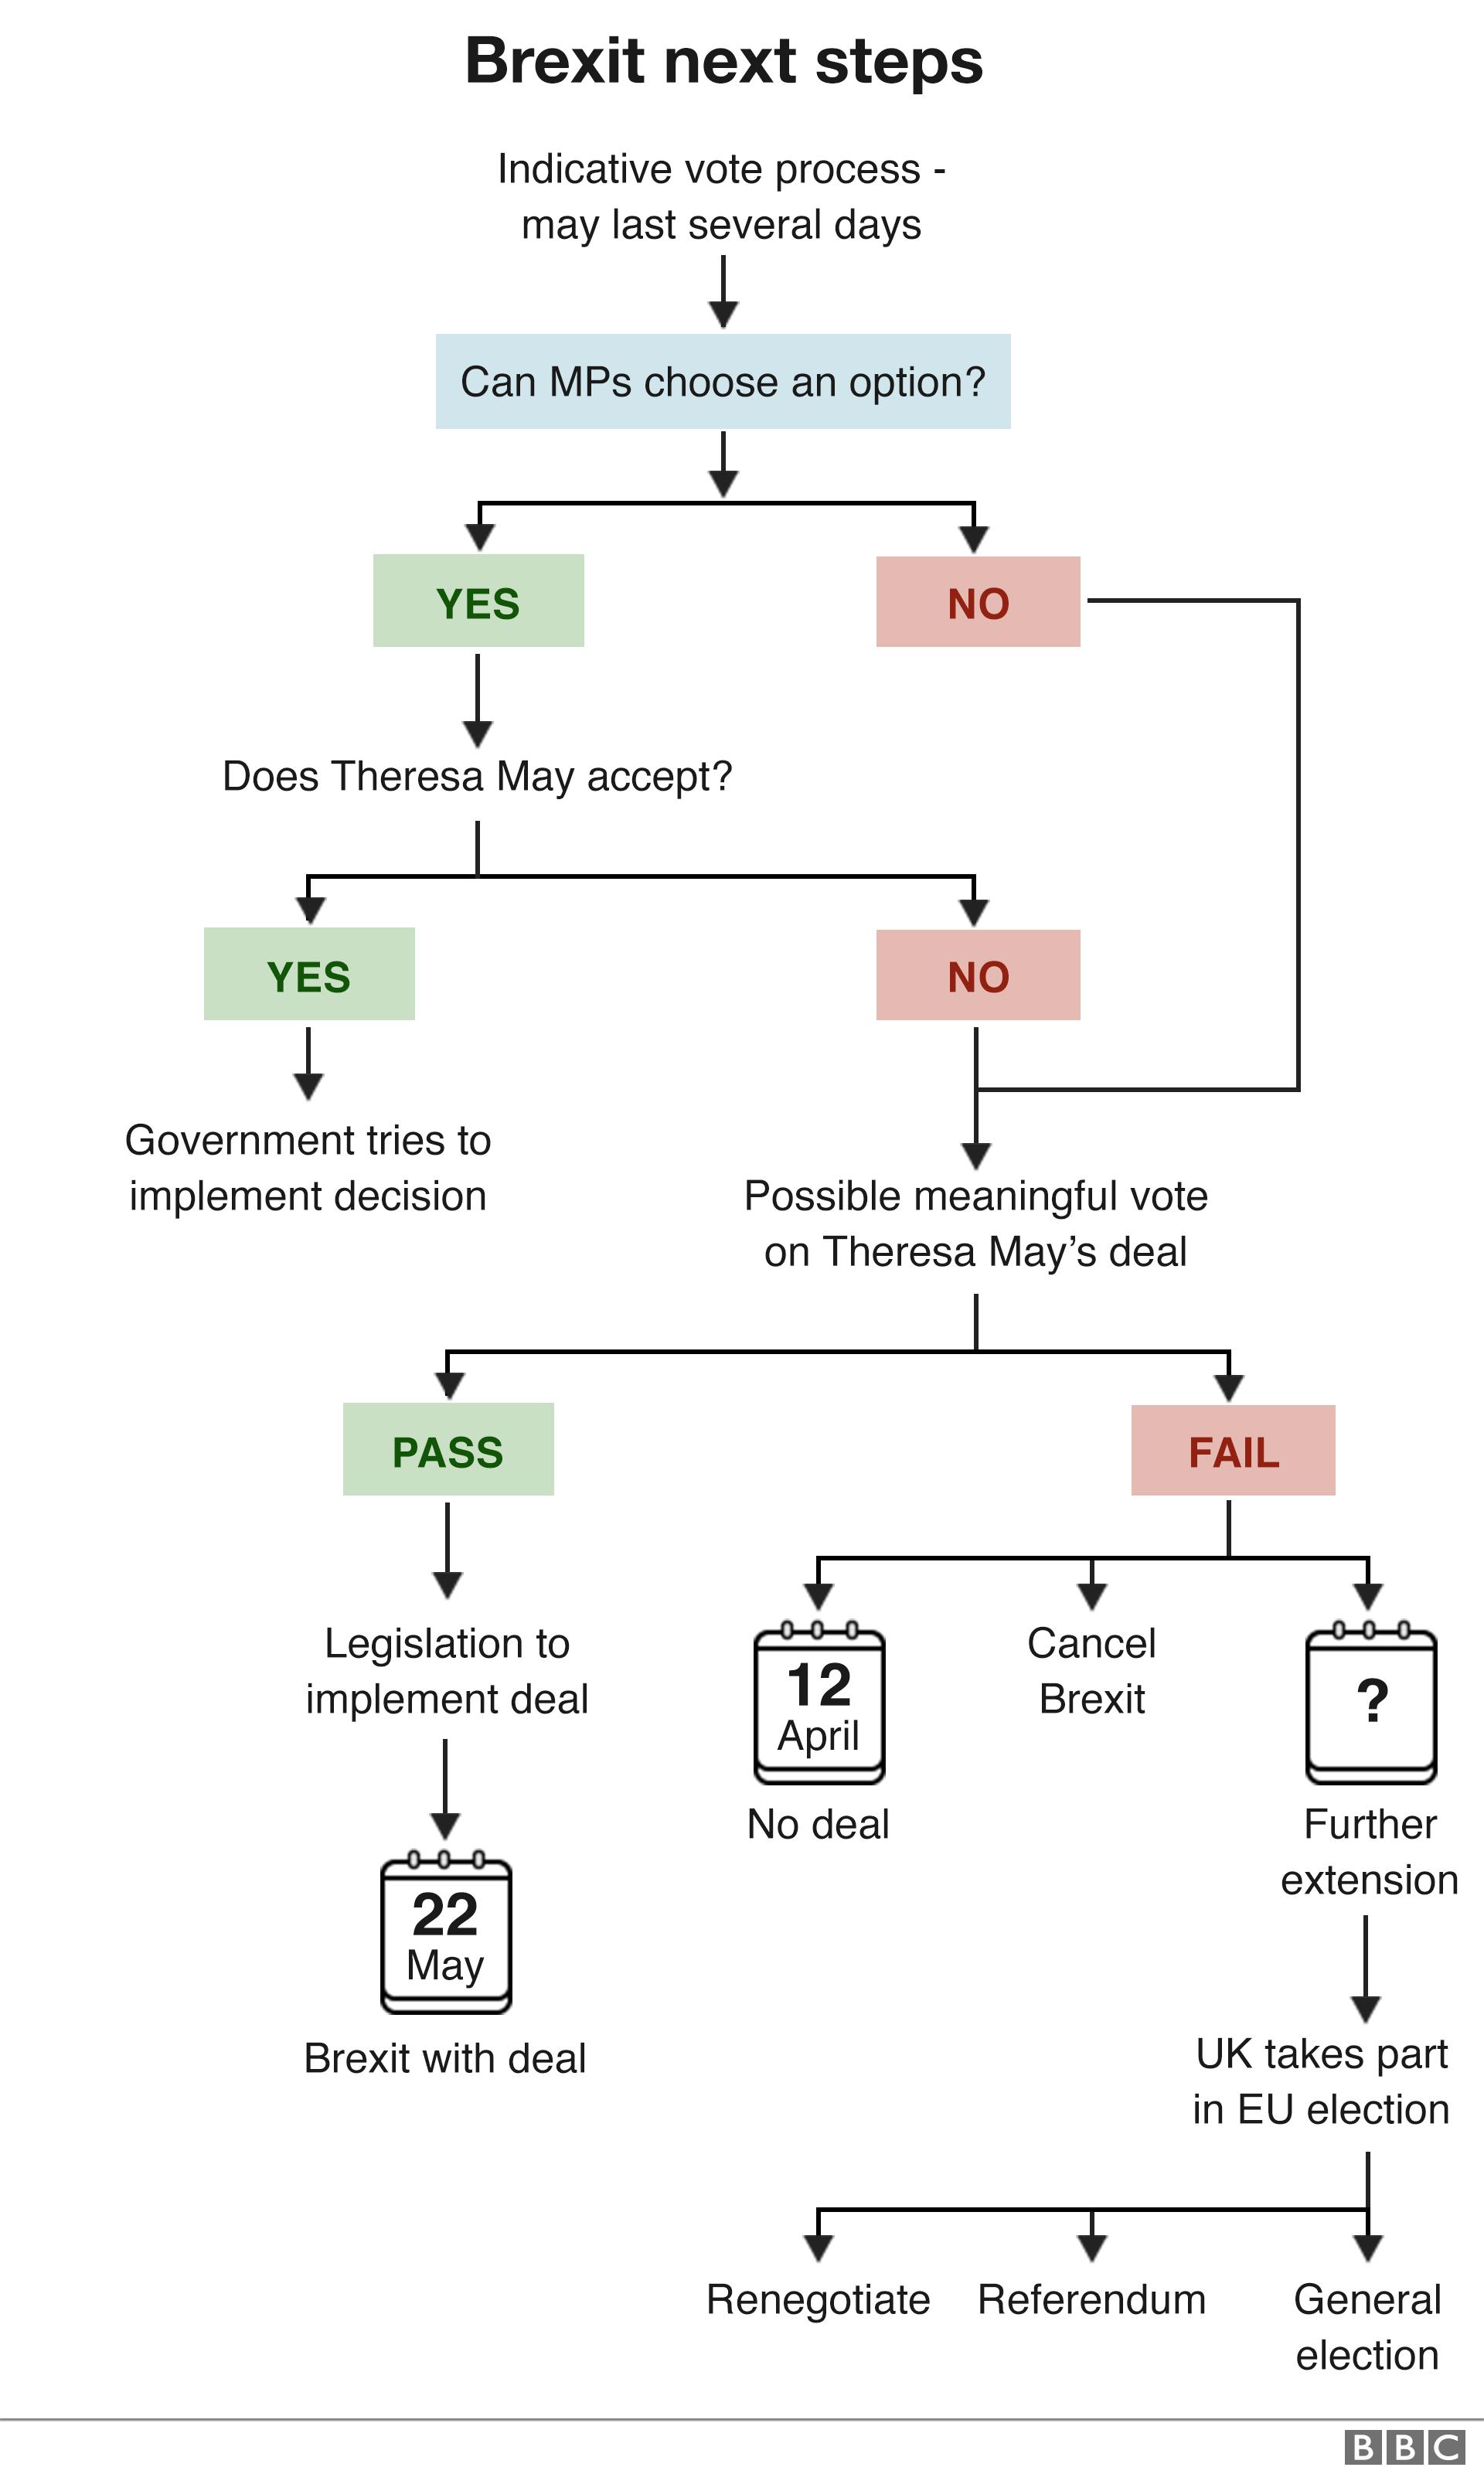 Brexit next steps flowchart expalining what happens after indicative votes